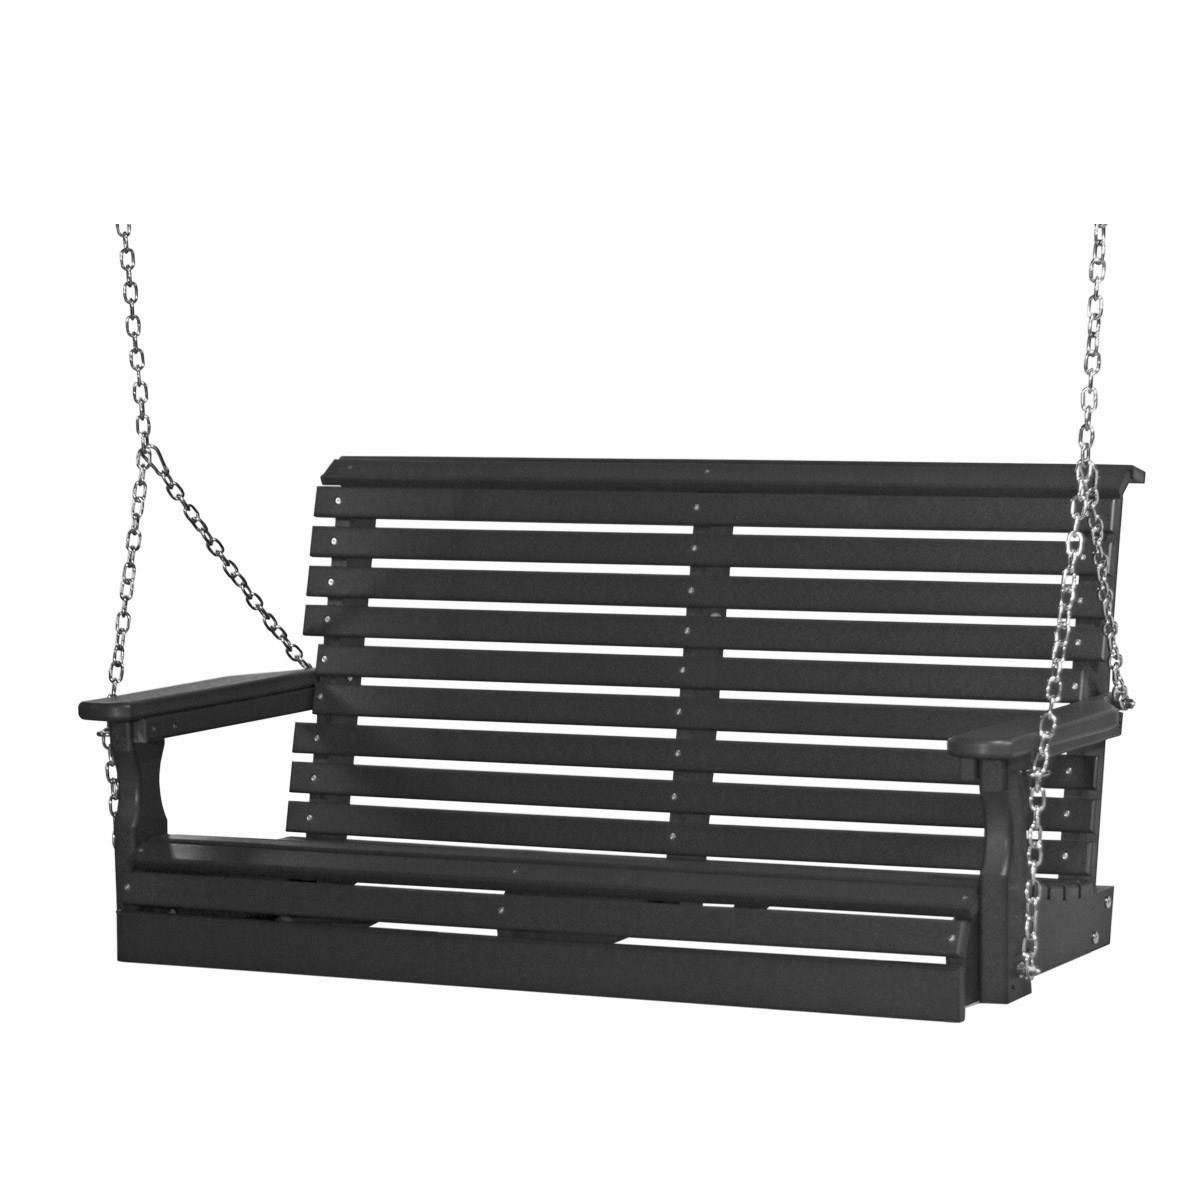 Latest Deuxville Plain Porch Swing Within Plain Porch Swings (View 4 of 30)